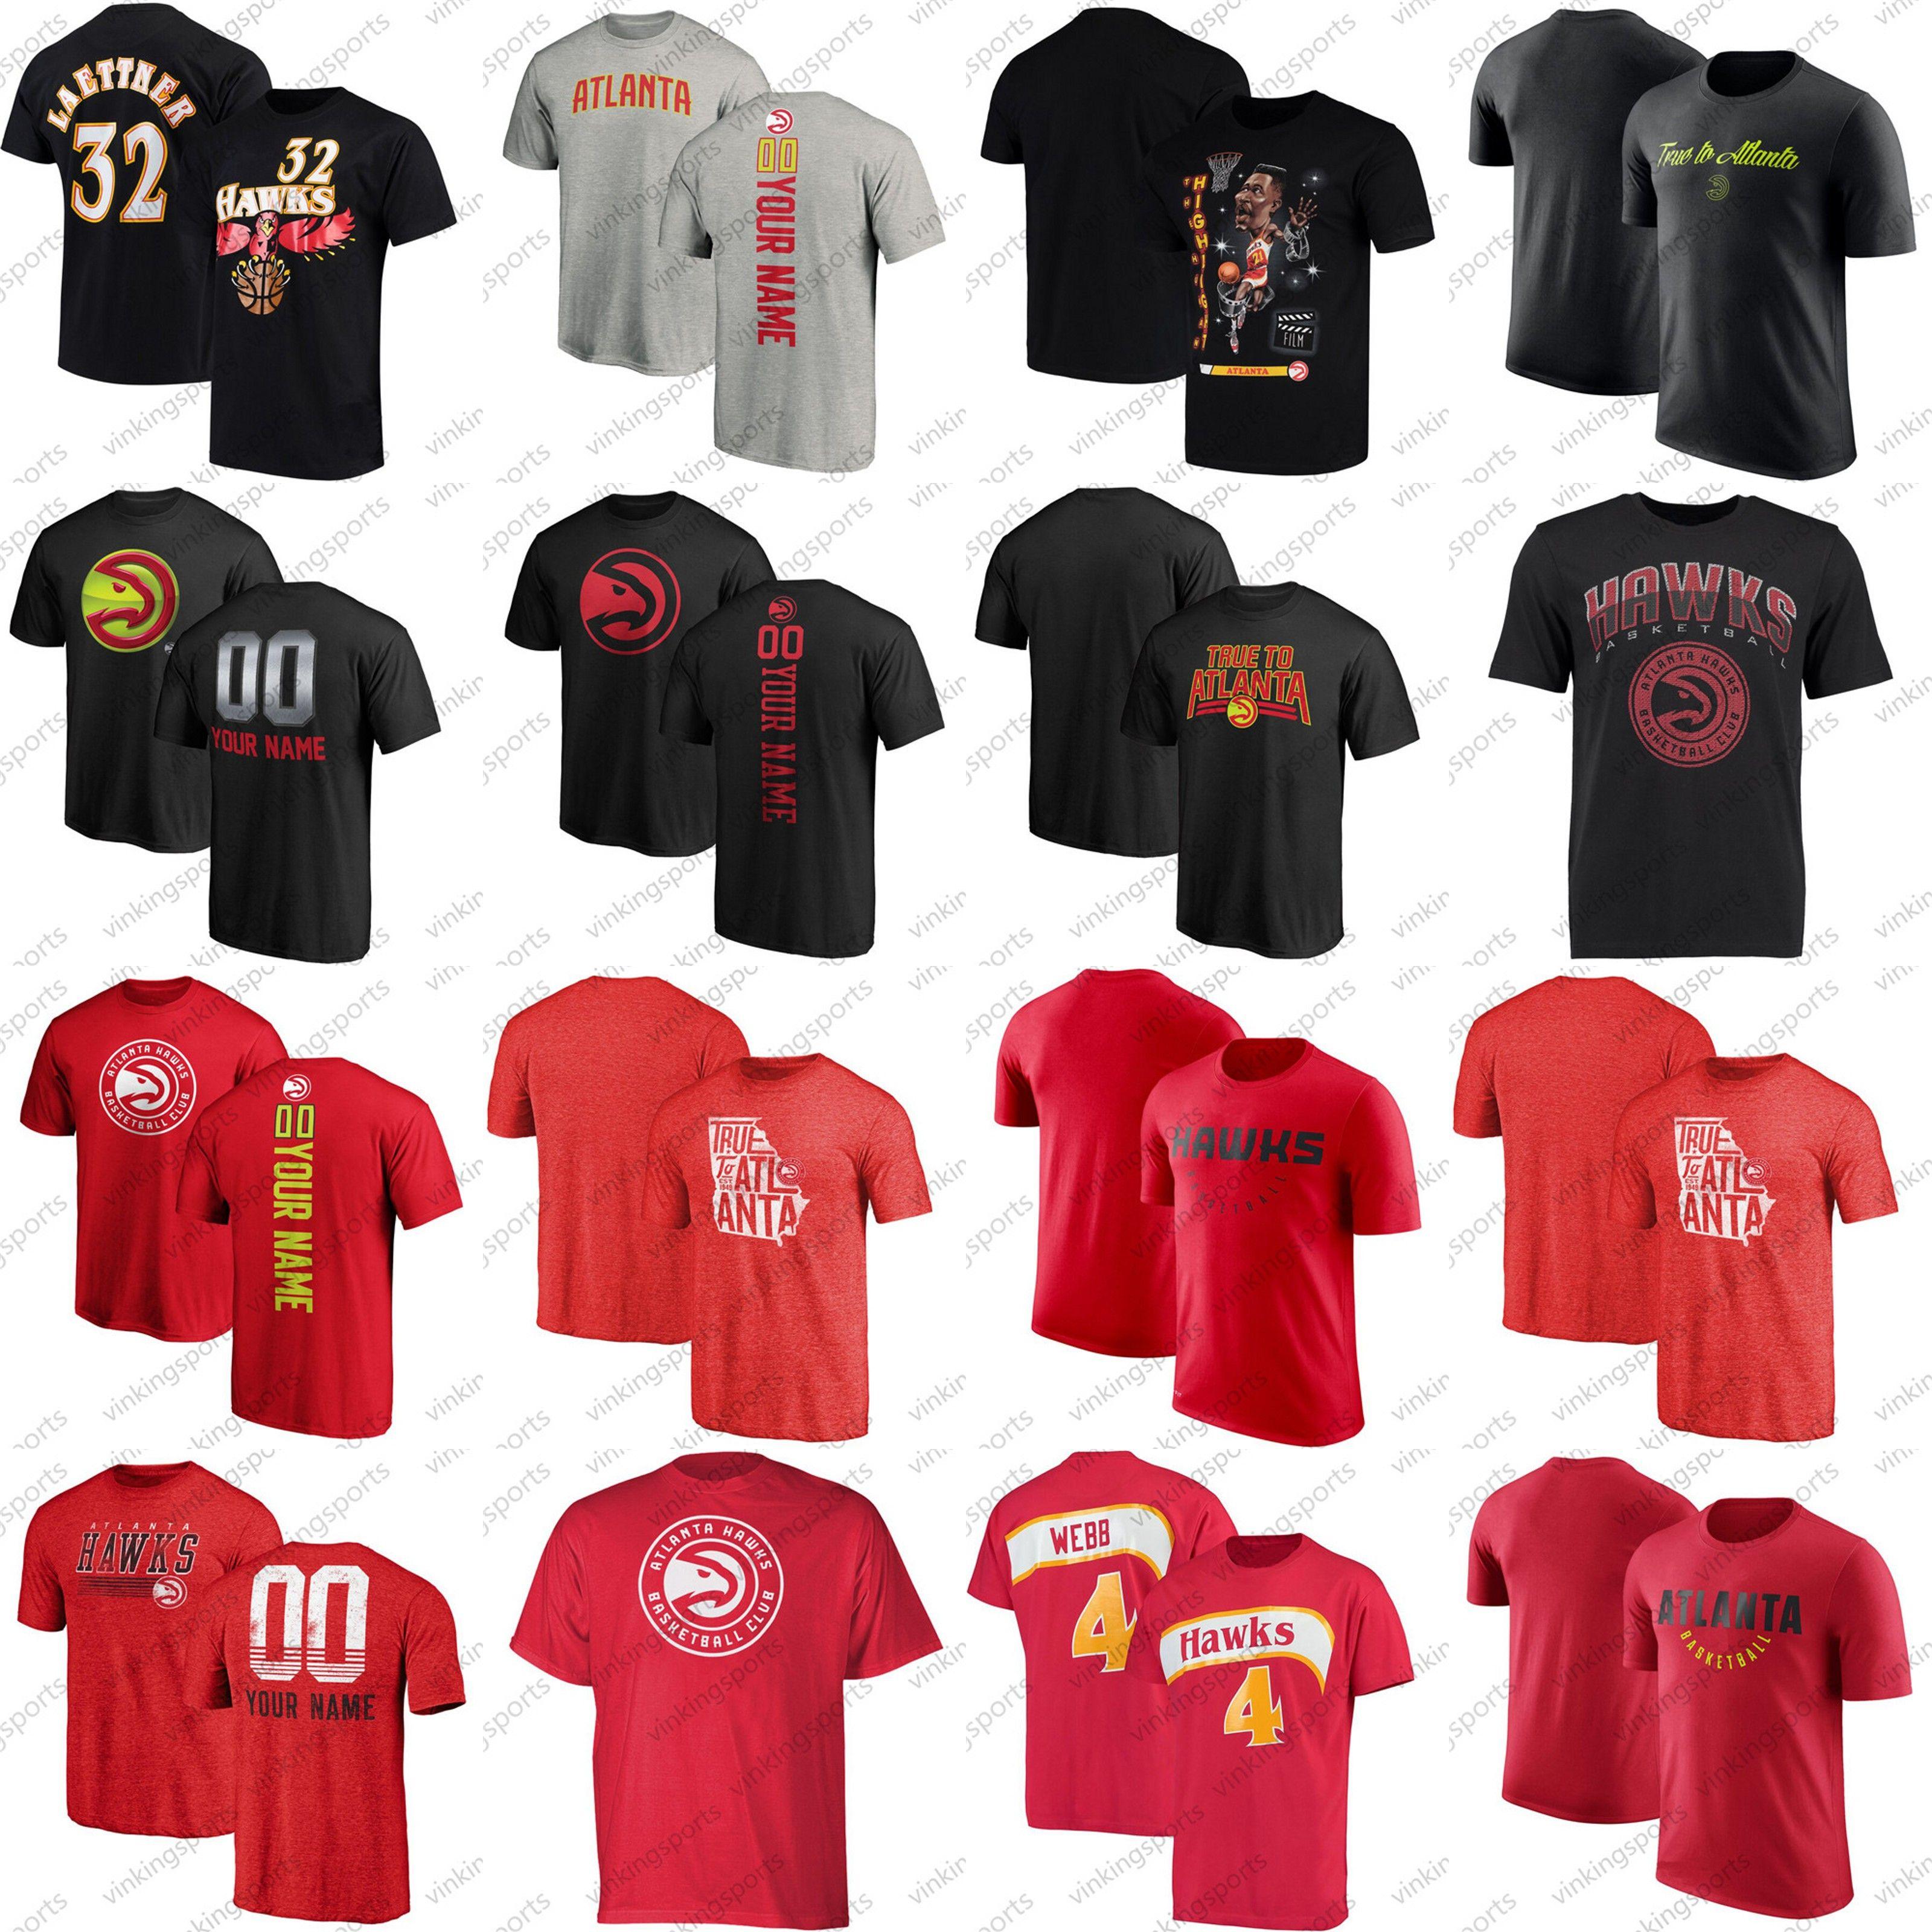 brand new 2f145 094de Custom Trae Young T-Shirt Dominique Wilkins Stacey Augmon Vince Carter  Dennis Schroder Kevin Huerter Dwight Howards Kent Bazemore S-XXXL Tee